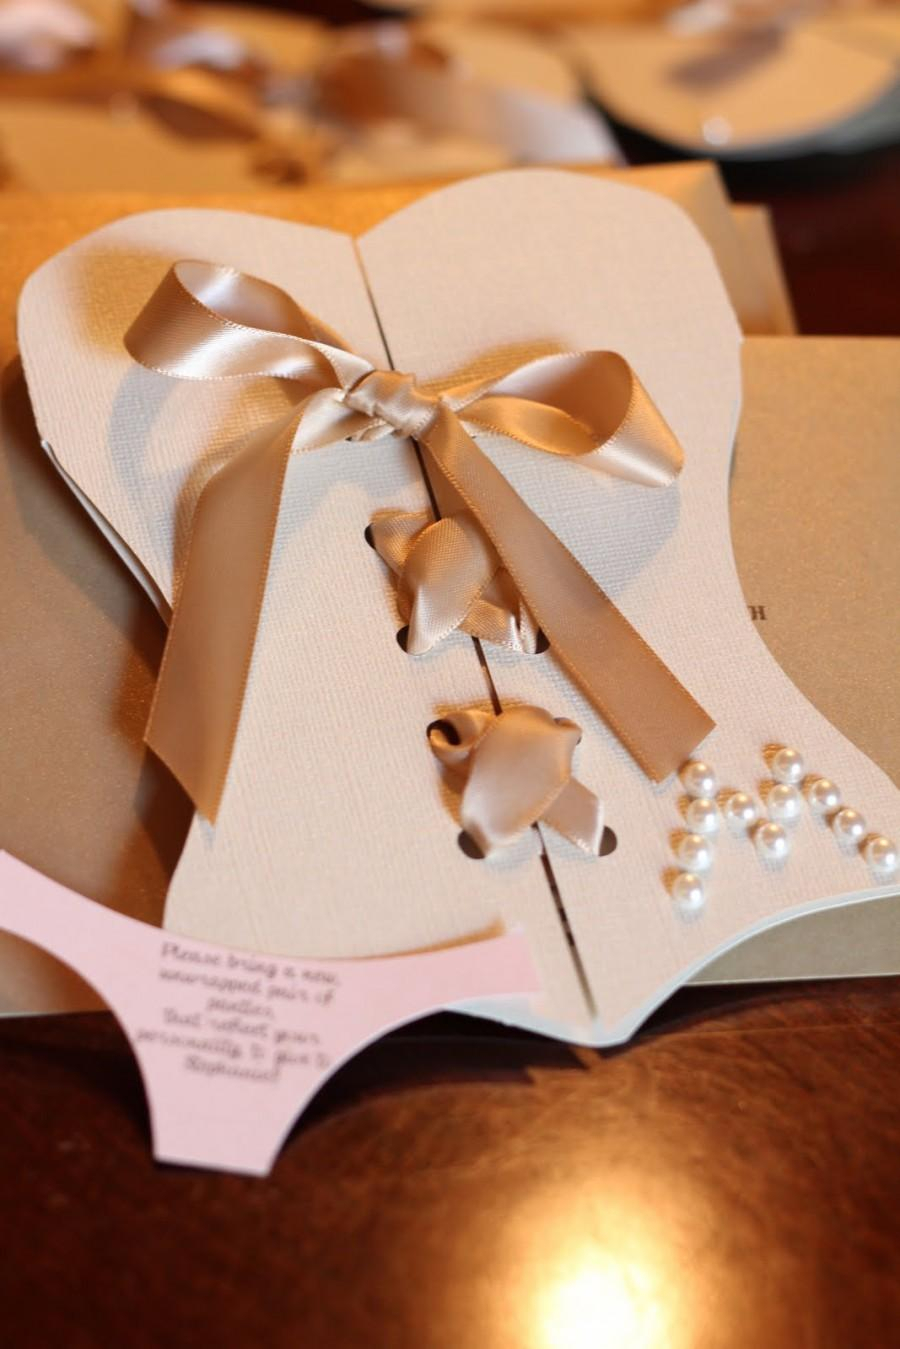 10 Most Recommended Diy Bridal Shower Invitations Ideas diy lingerie bachelorette party invitations e299a5 unique and creative 2020